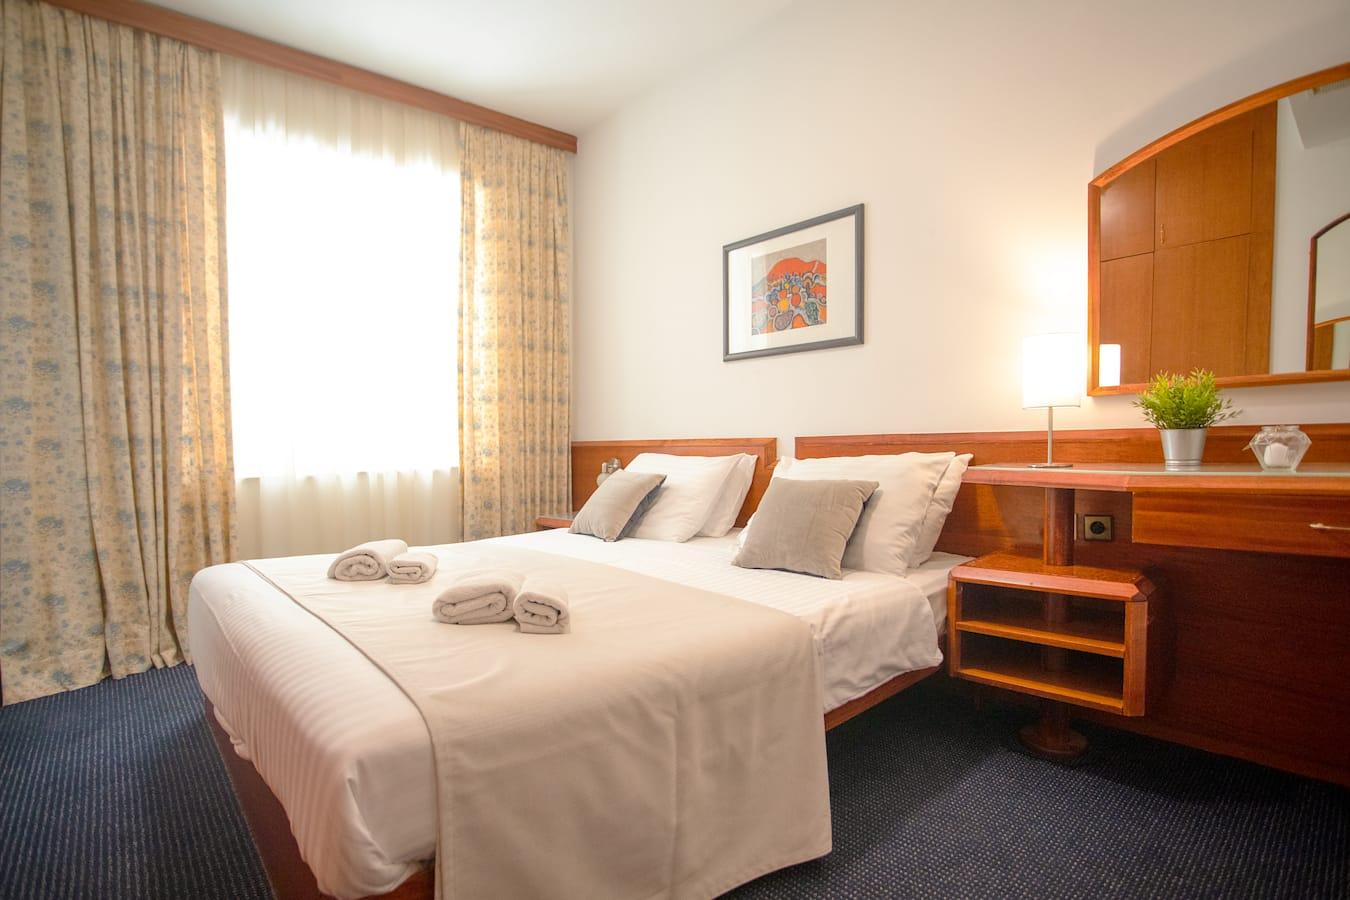 komodor-hotel-dubrovnik-double-room.jpg